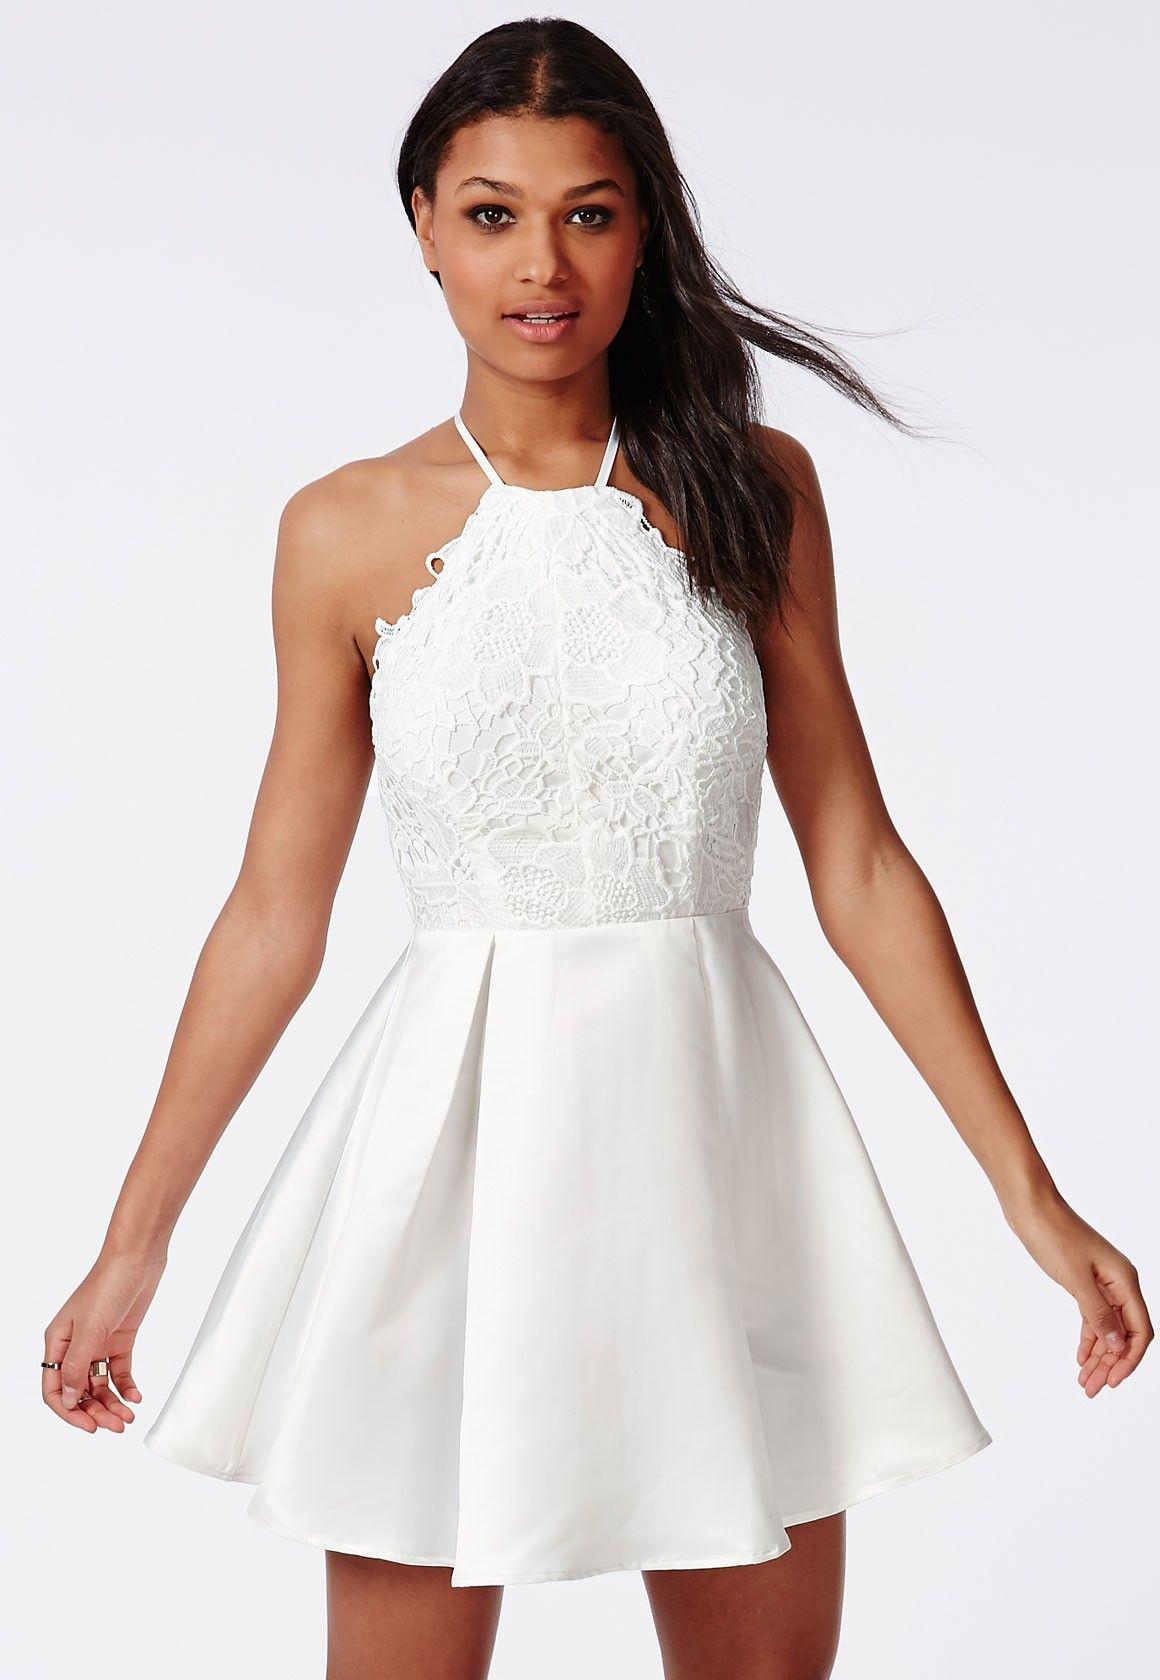 Lace Halterneck Skater Dress White - Dresses - Skater Dresses - Missguided 9407cdf3d